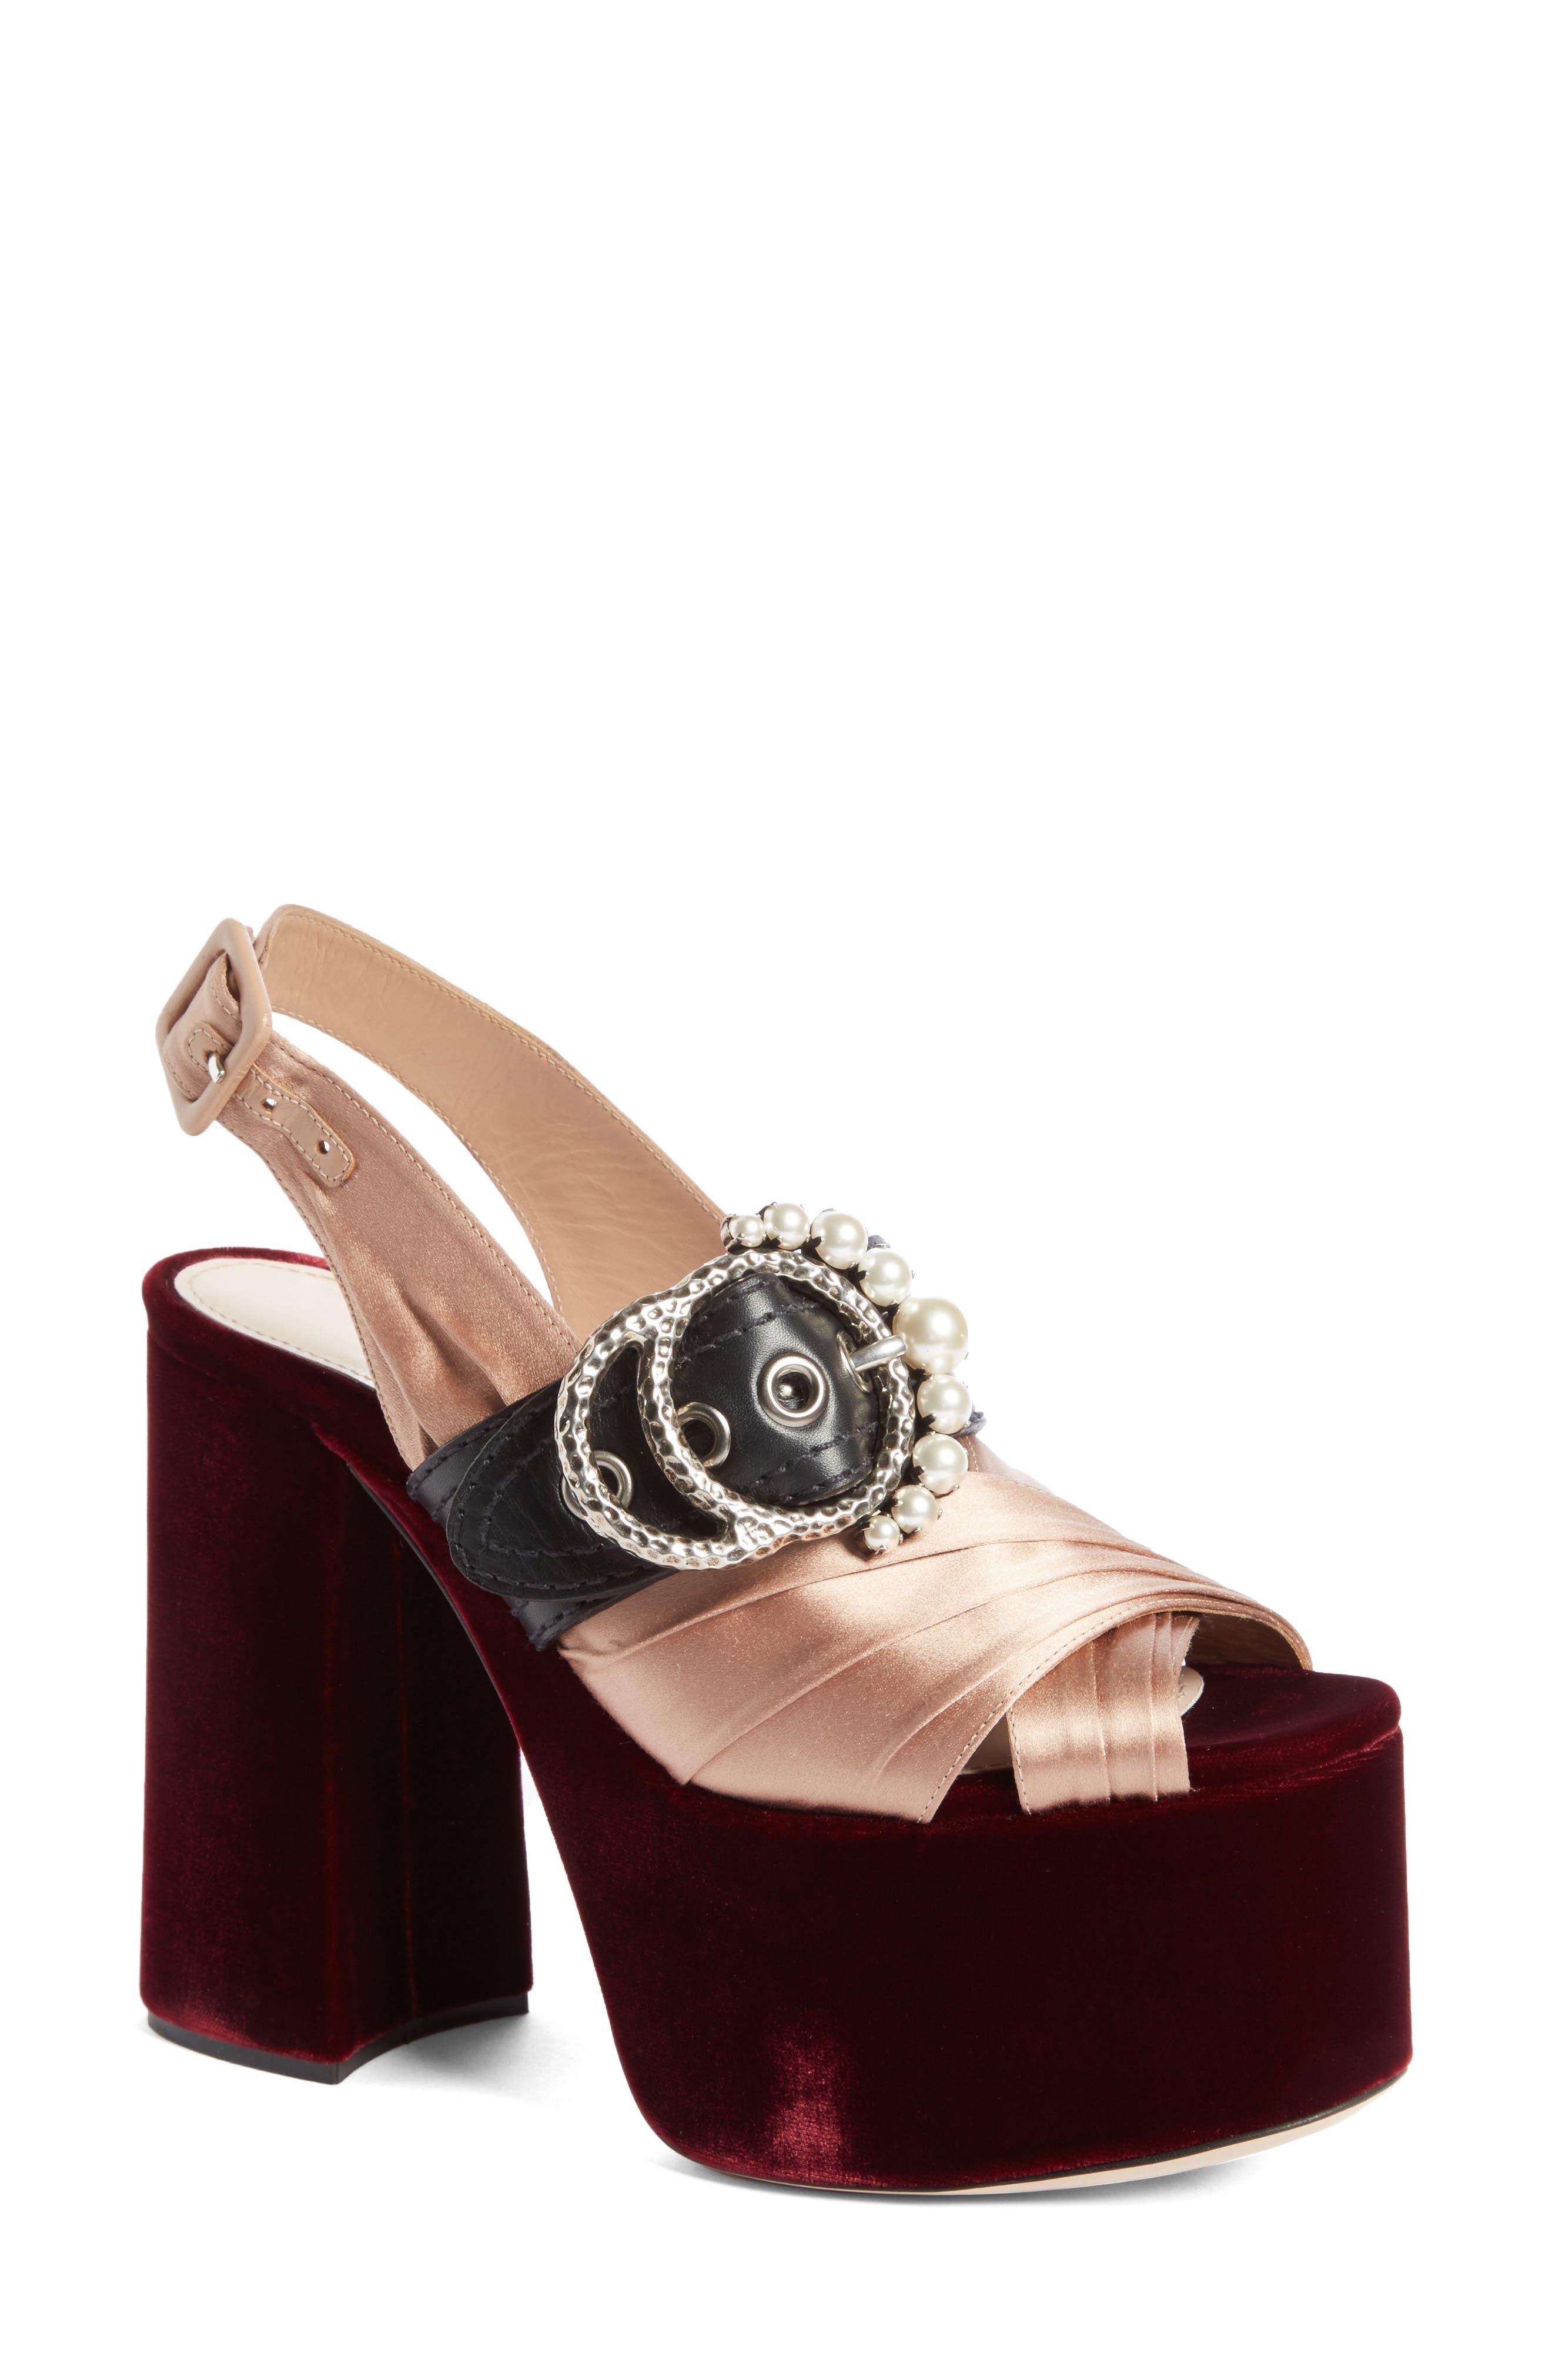 Main Image - Miu Miu Imitation Pearl Slingback Platform Sandal (Women)